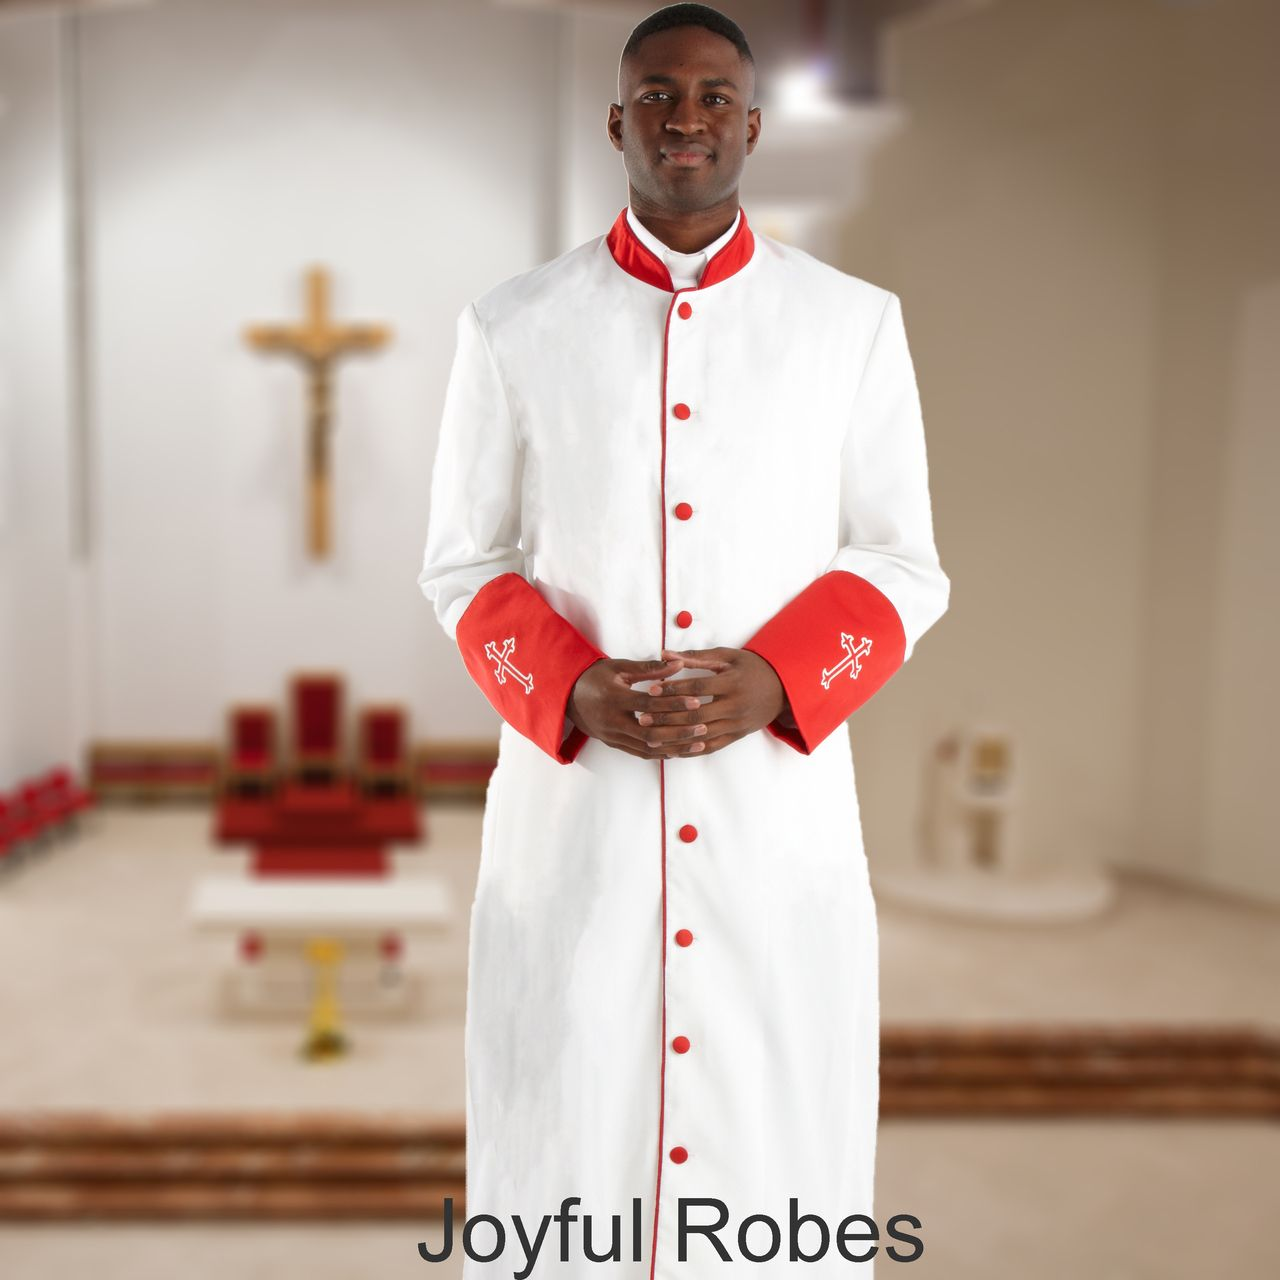 311 M. Men's Pastor/Clergy Robe - White/Red Cuff